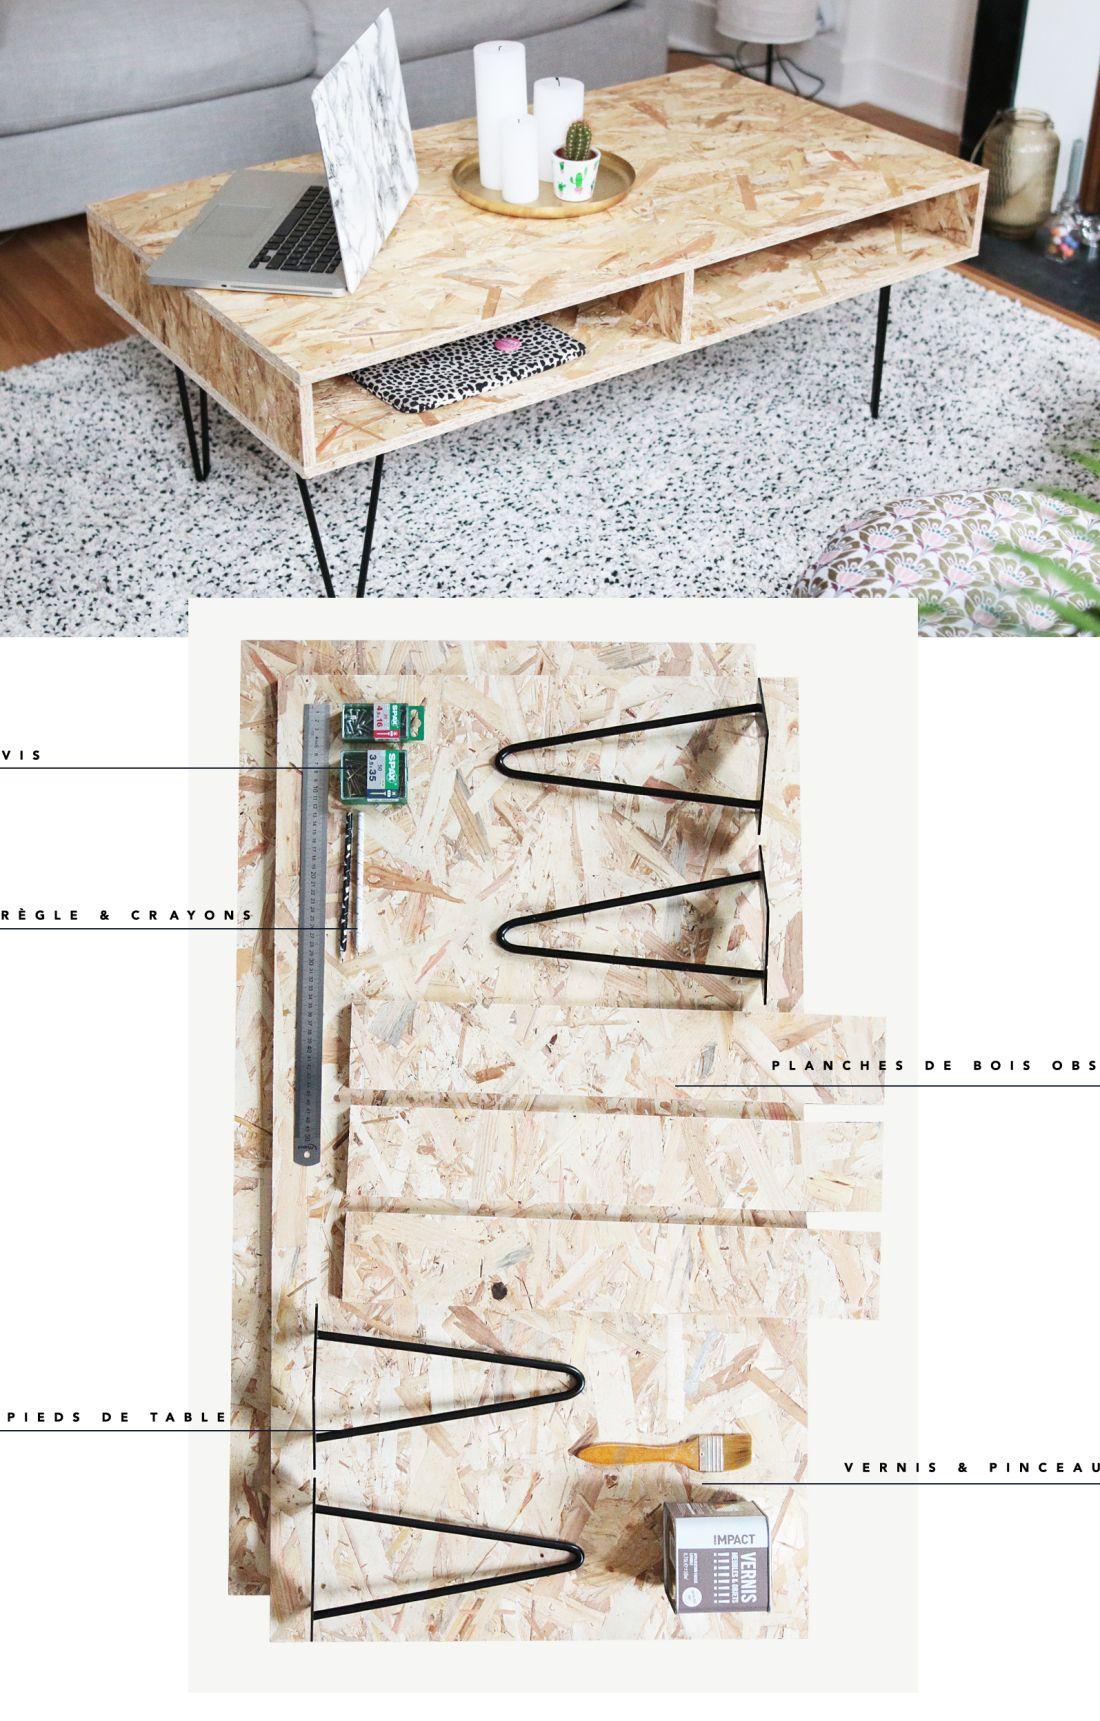 Diy Deco Realiser Une Table Basse Design En Bois Osb New Dawn Of